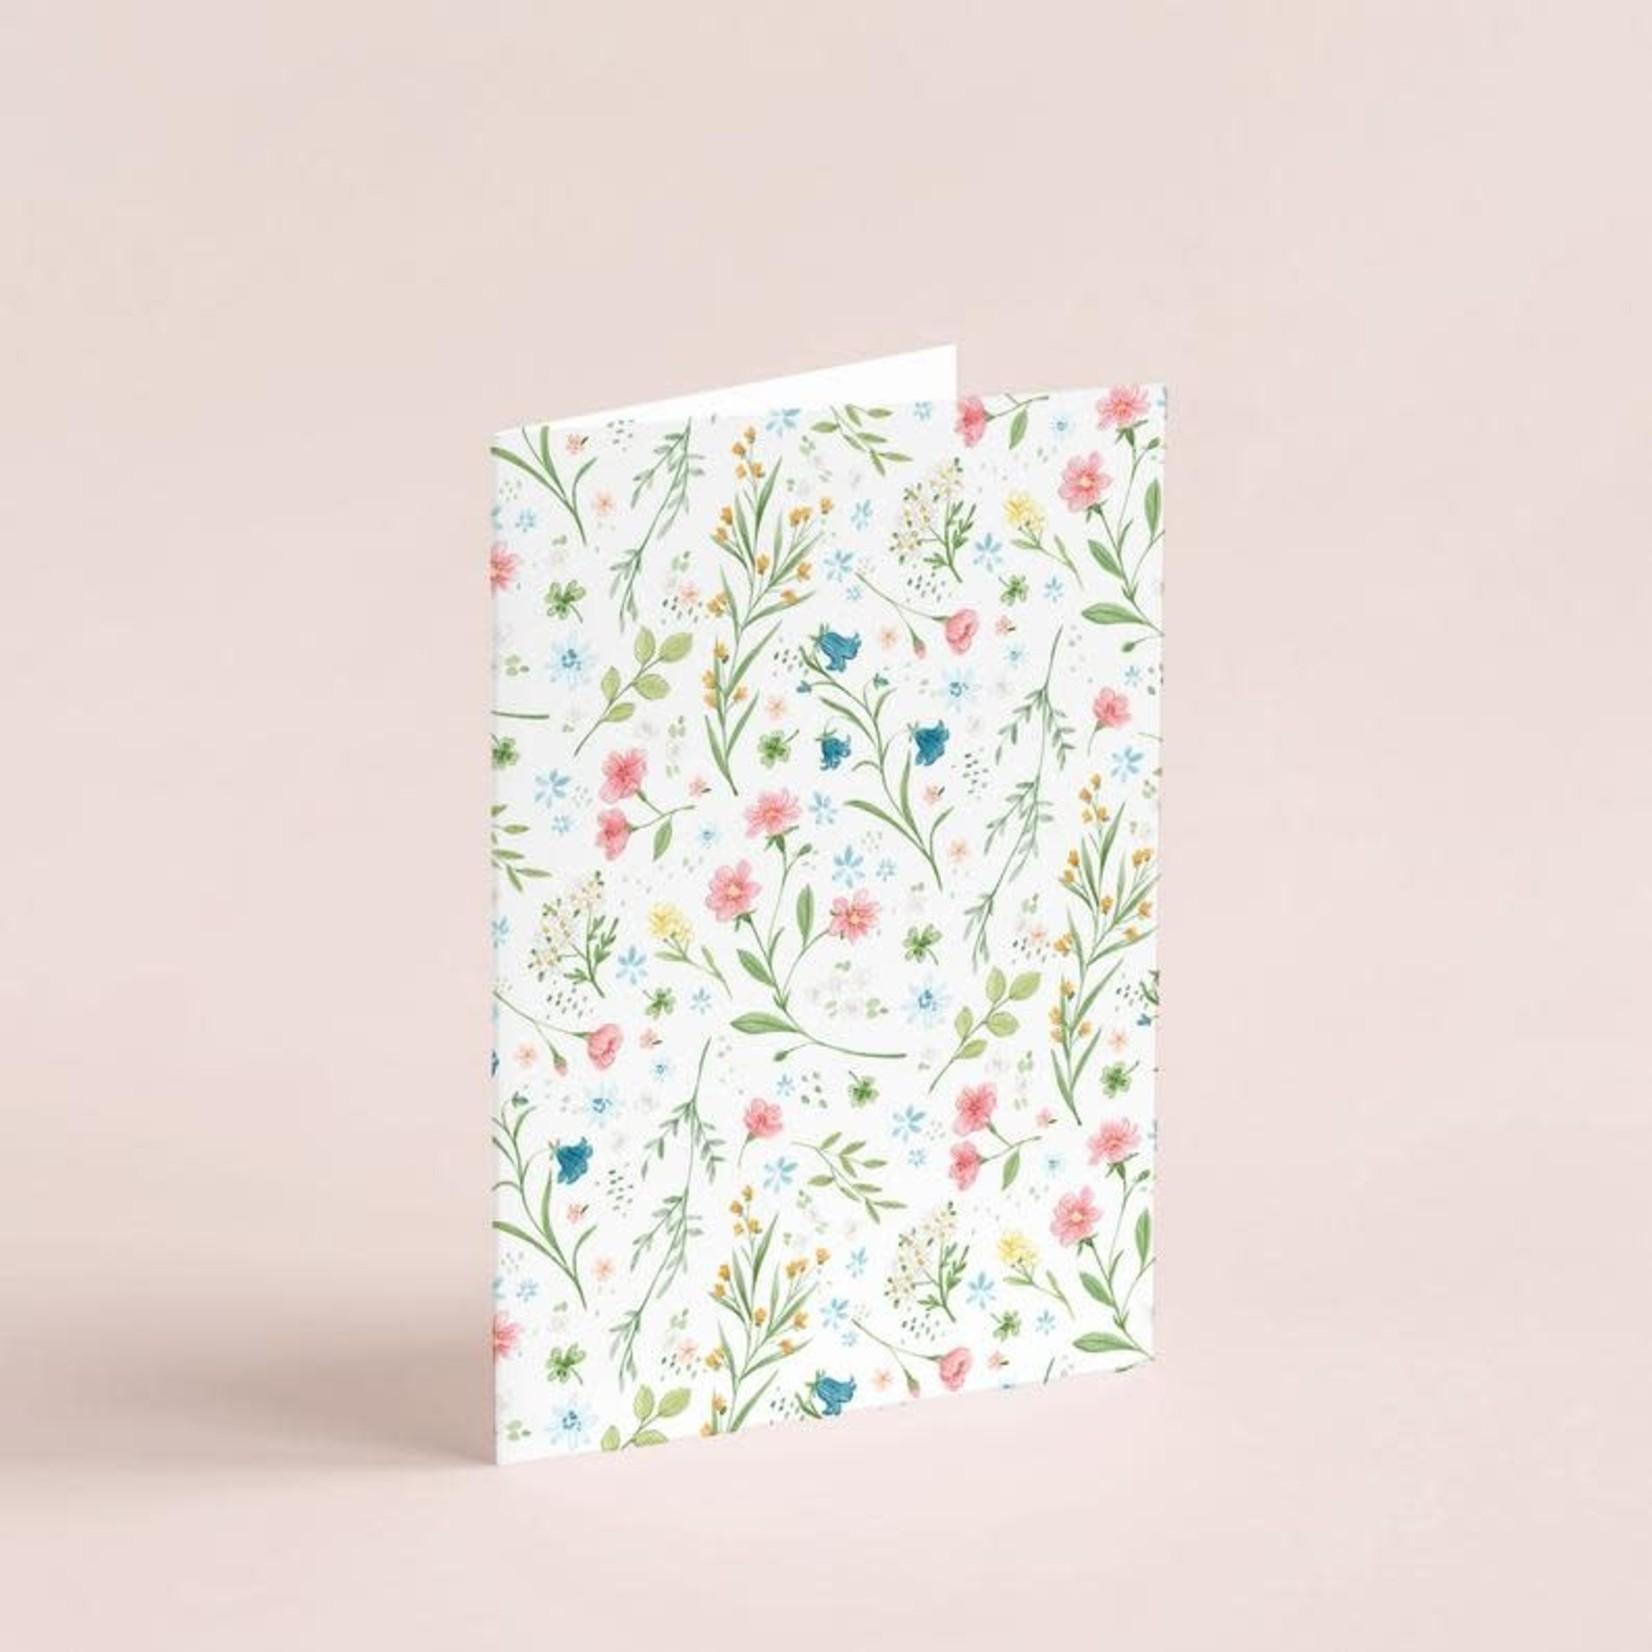 Joannie Houle Carte Petites fleurs